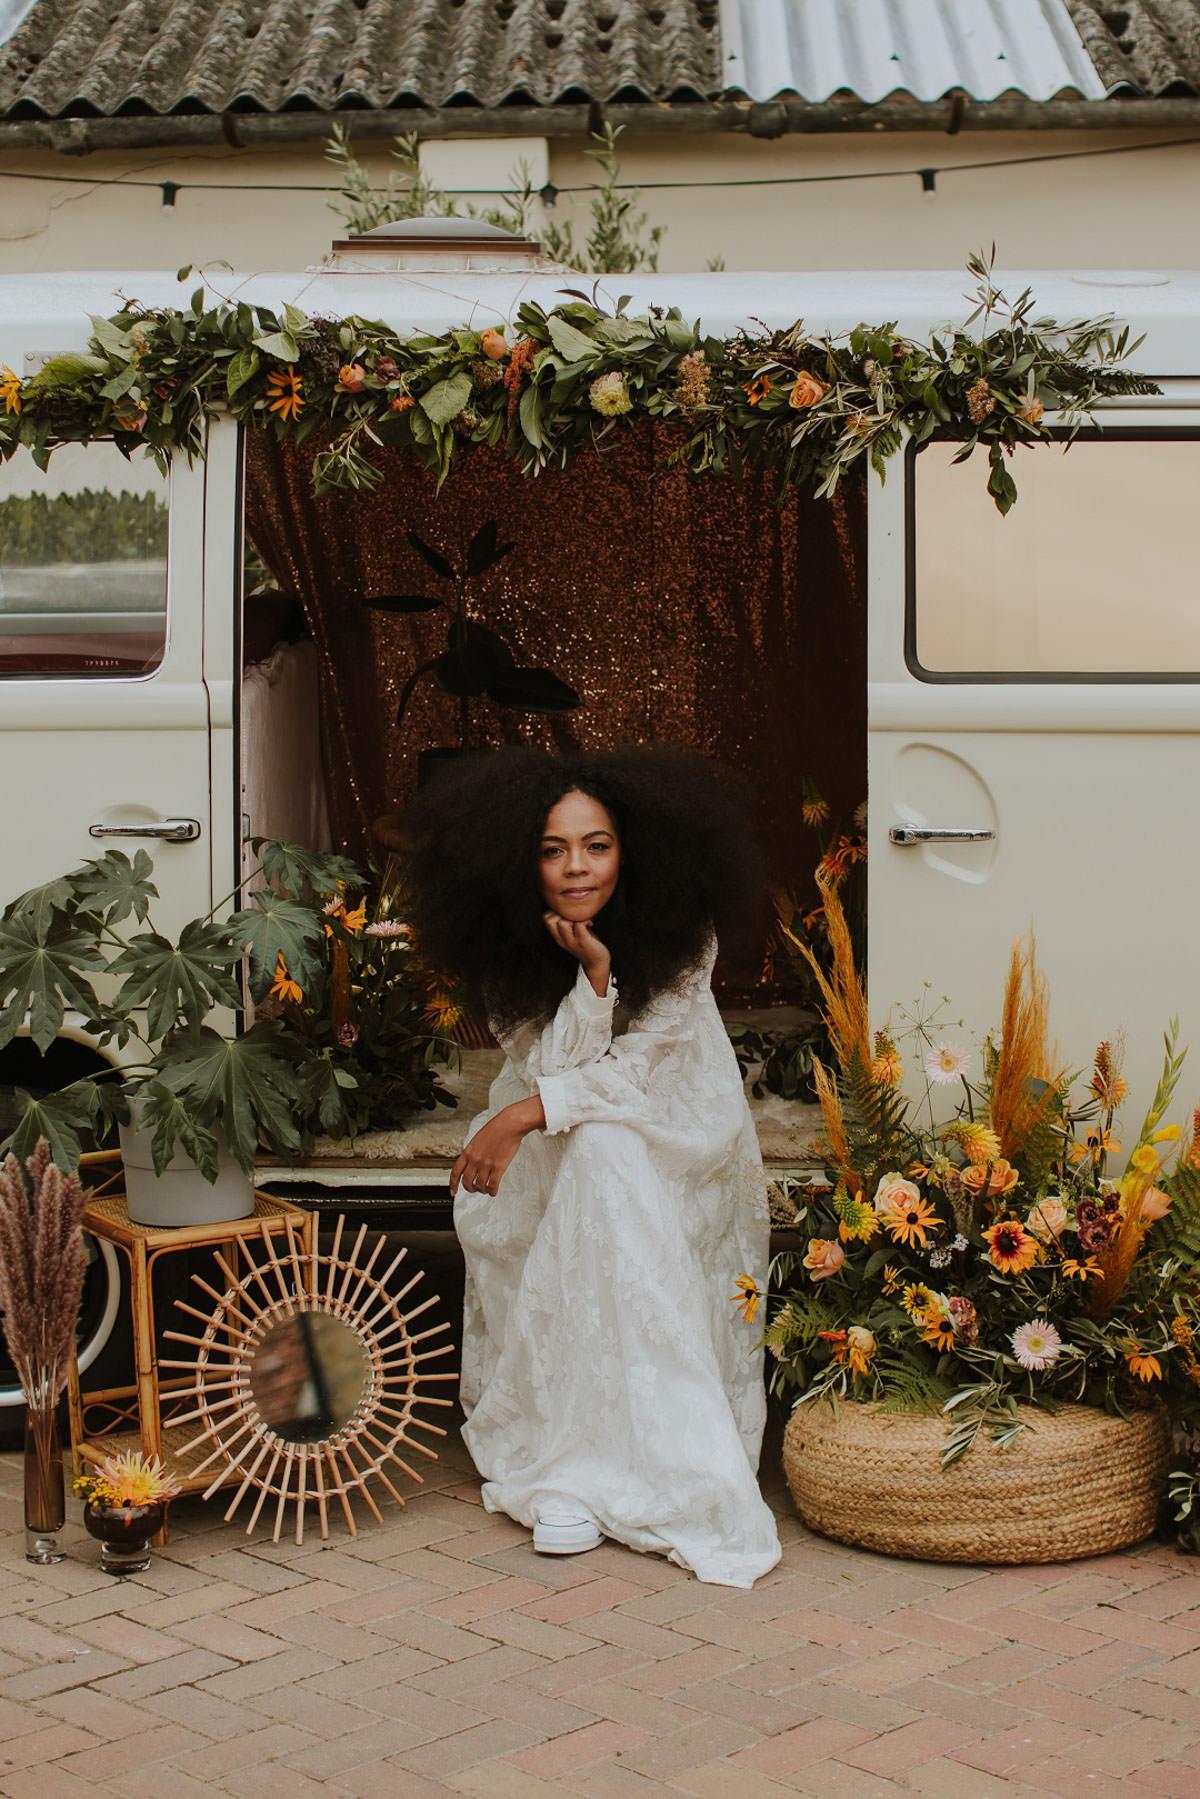 Free-spirited + bohemian wedding inspiration at Stratton Court B